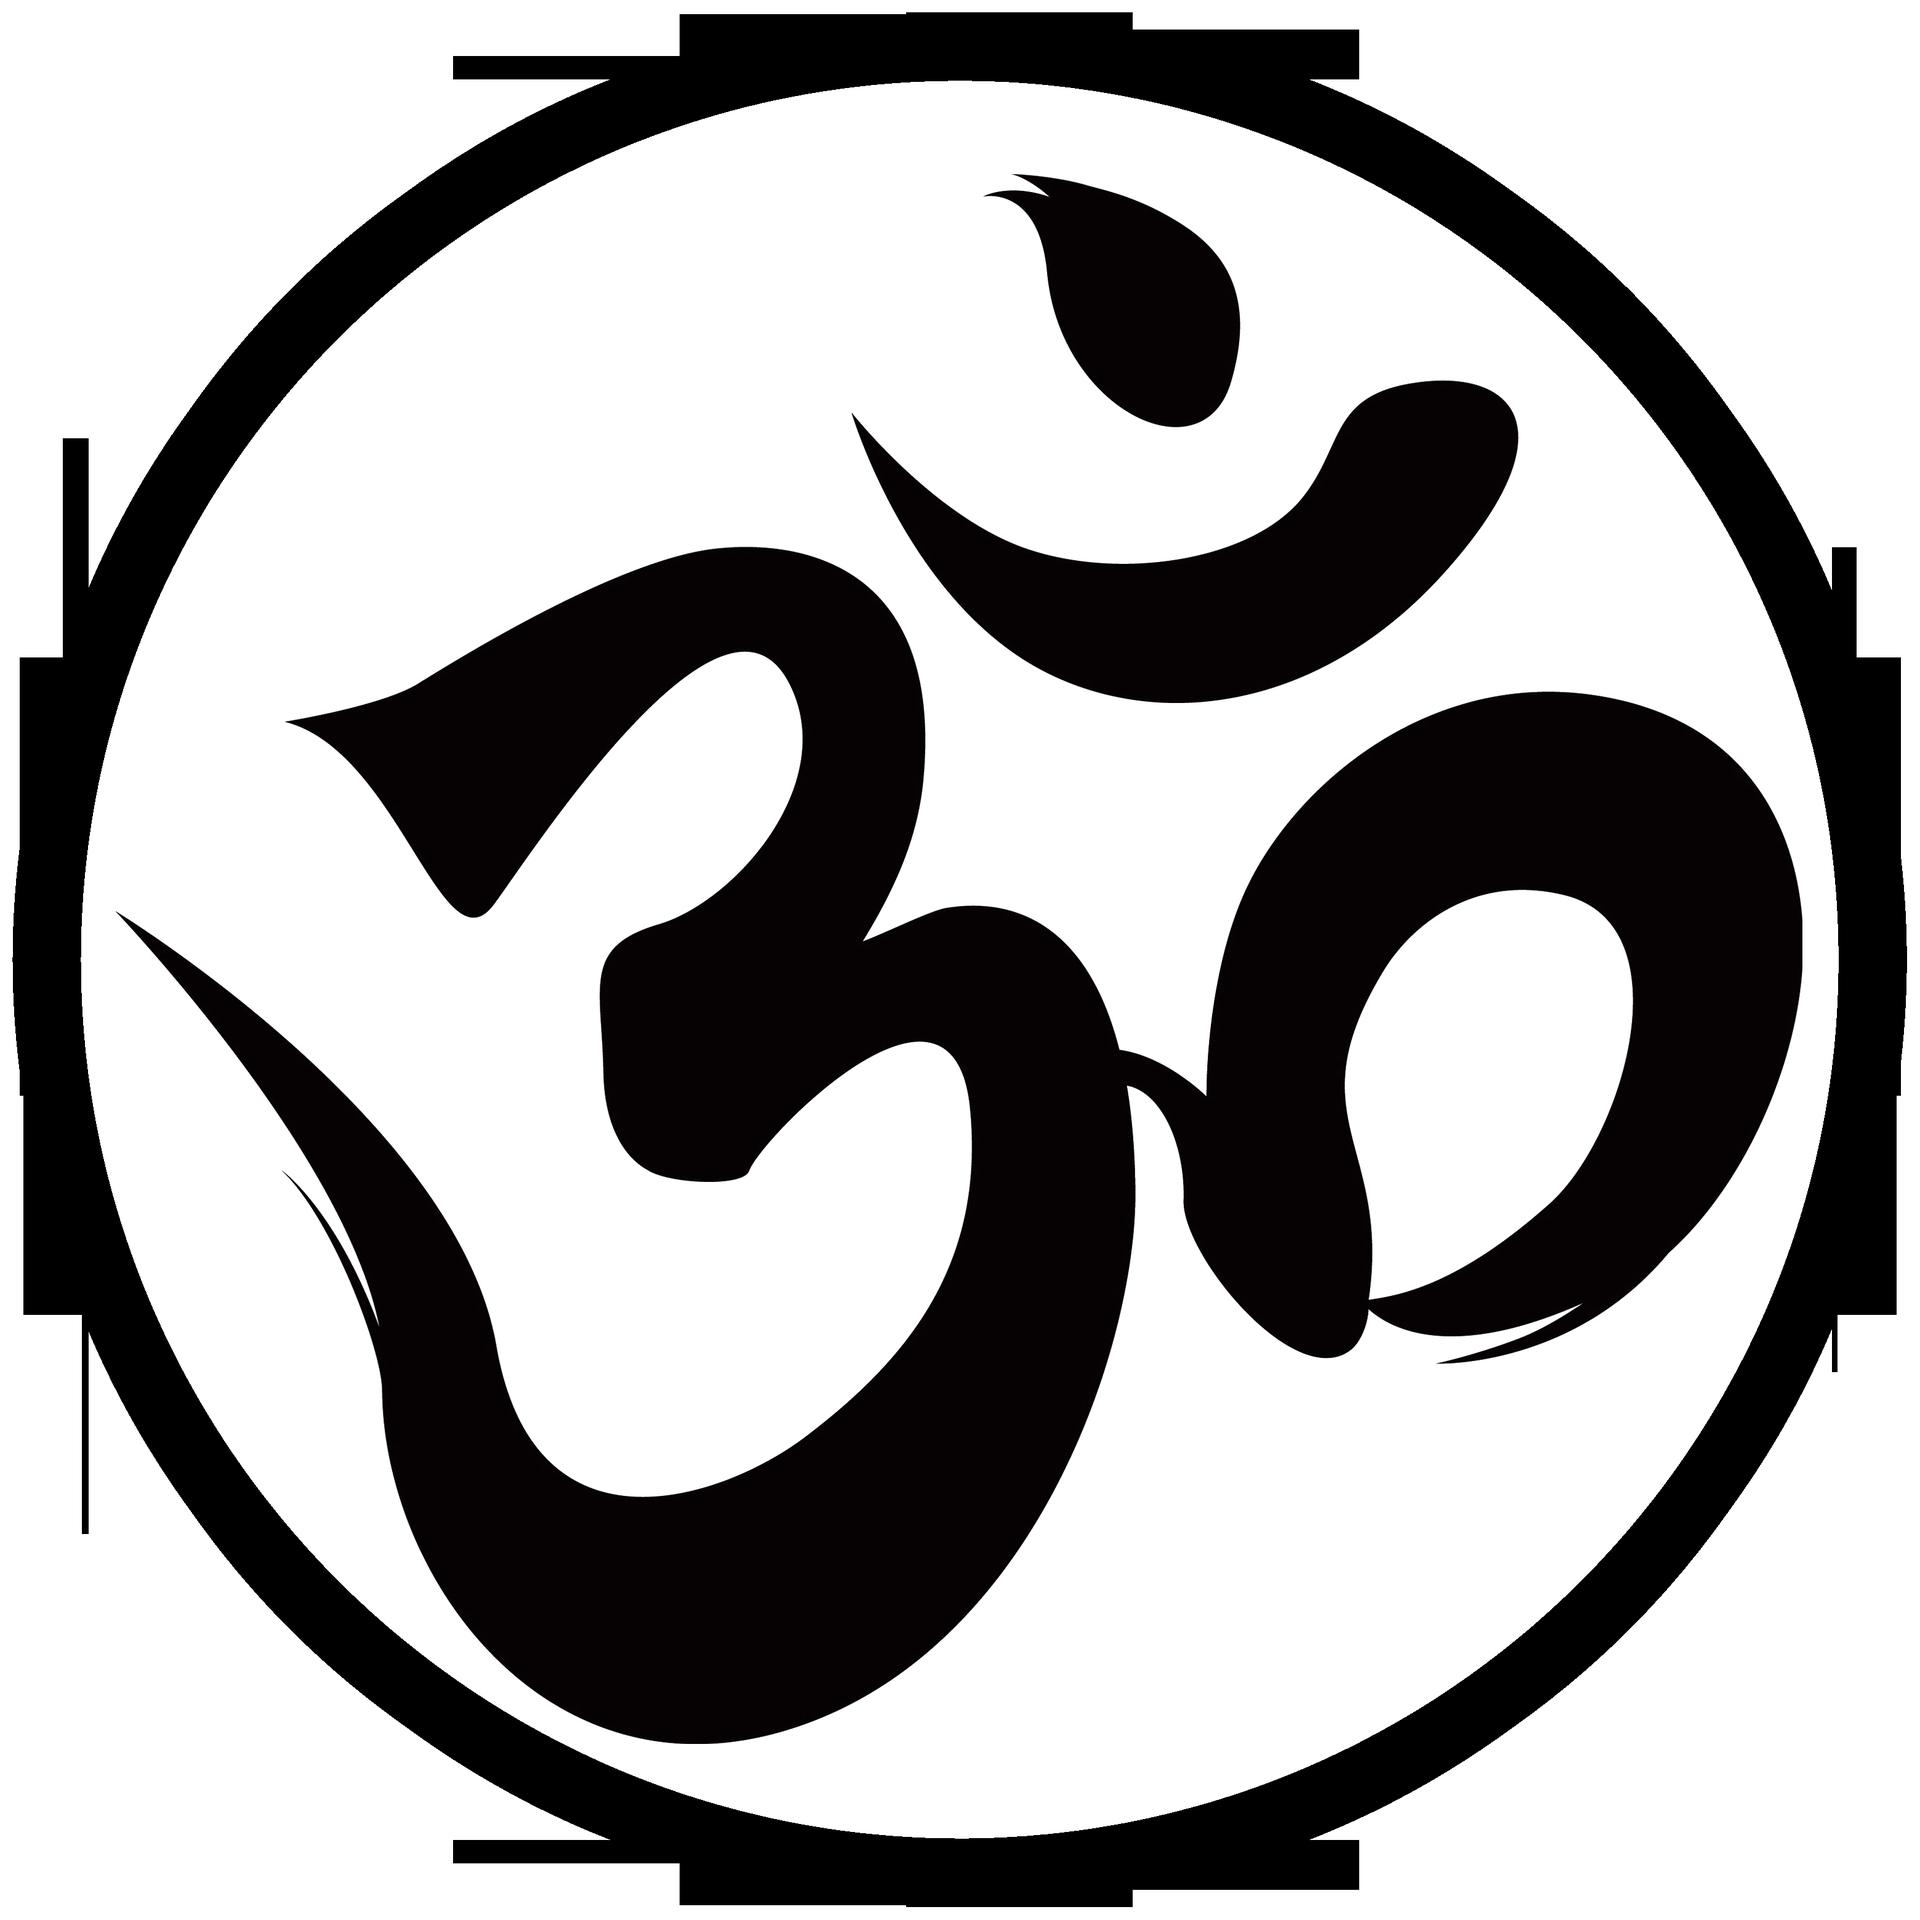 Om Symbol Ohm Meaning Alt code.